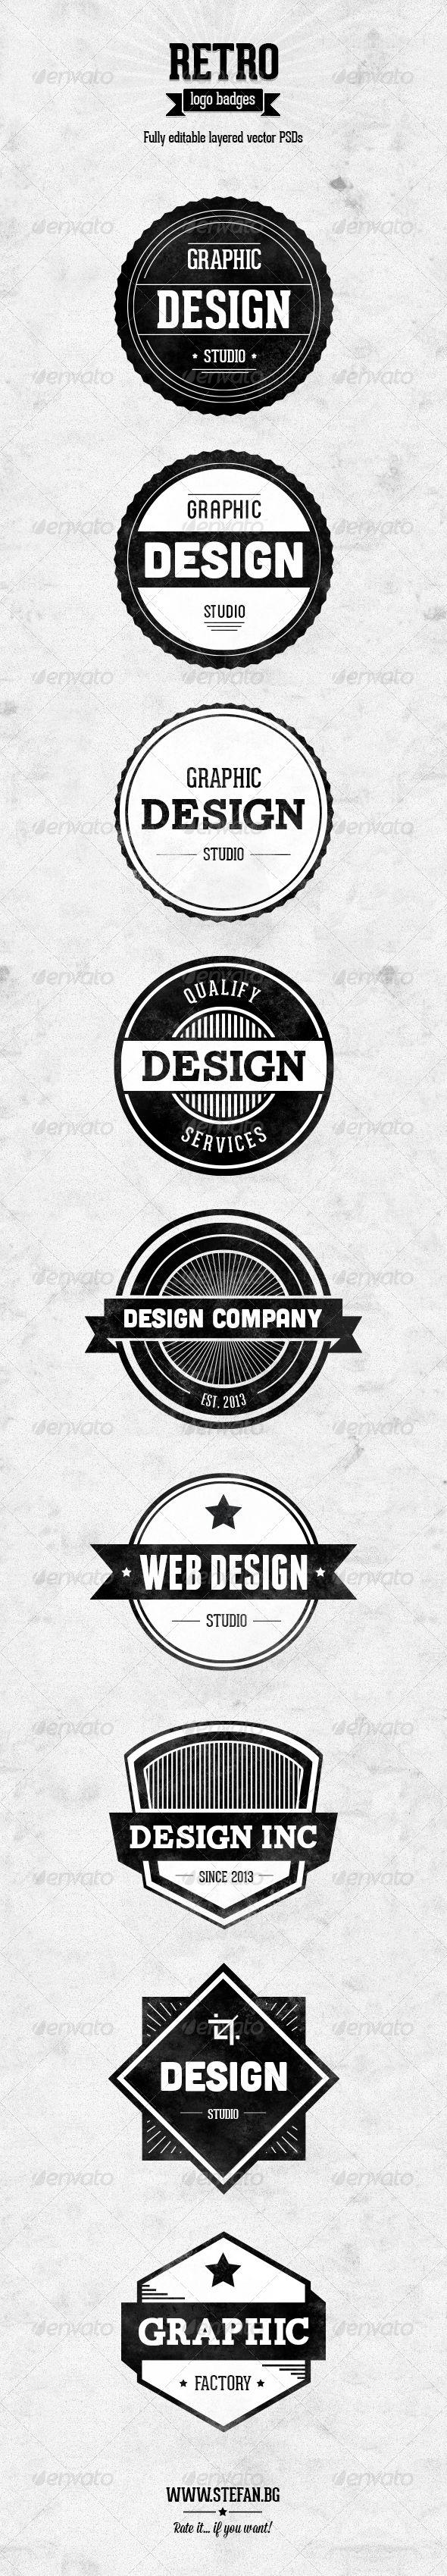 Retro Logo Badges - Badges & Stickers Web Elements